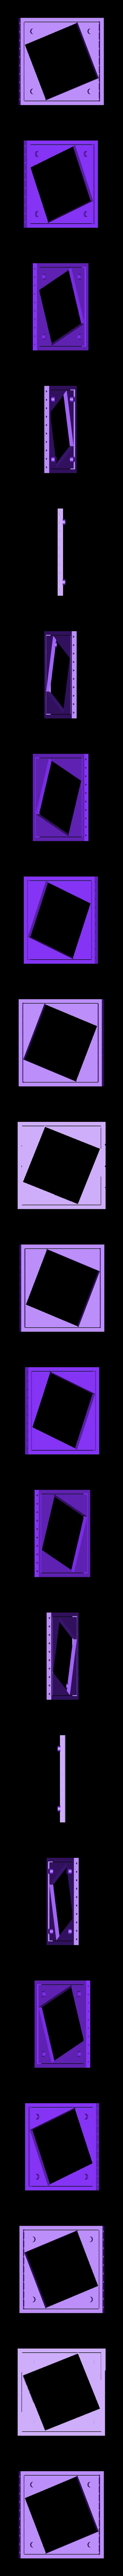 PythagoreanTheorem20_50_sqrt_2900.stl Download free STL file Pythagorean Theorem, Visual Proof, Chinese Origin • 3D printer template, LGBU